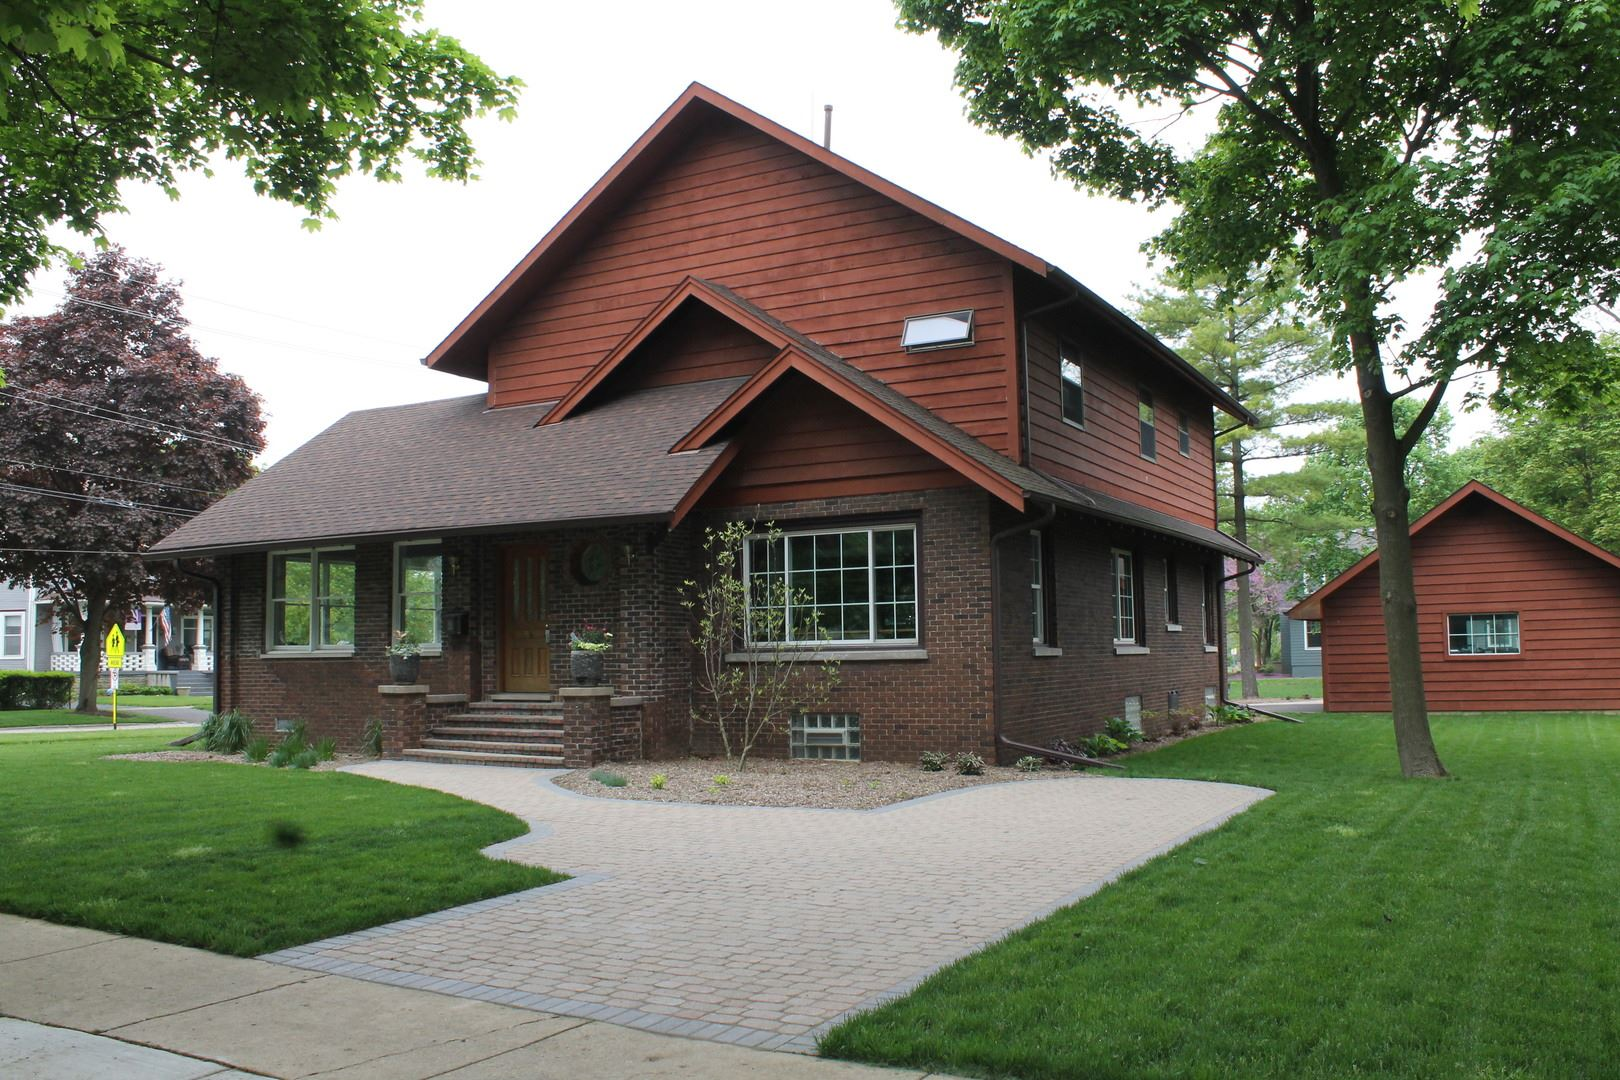 56 S Caroline Street, Crystal Lake, IL 60014 - #: 10643689